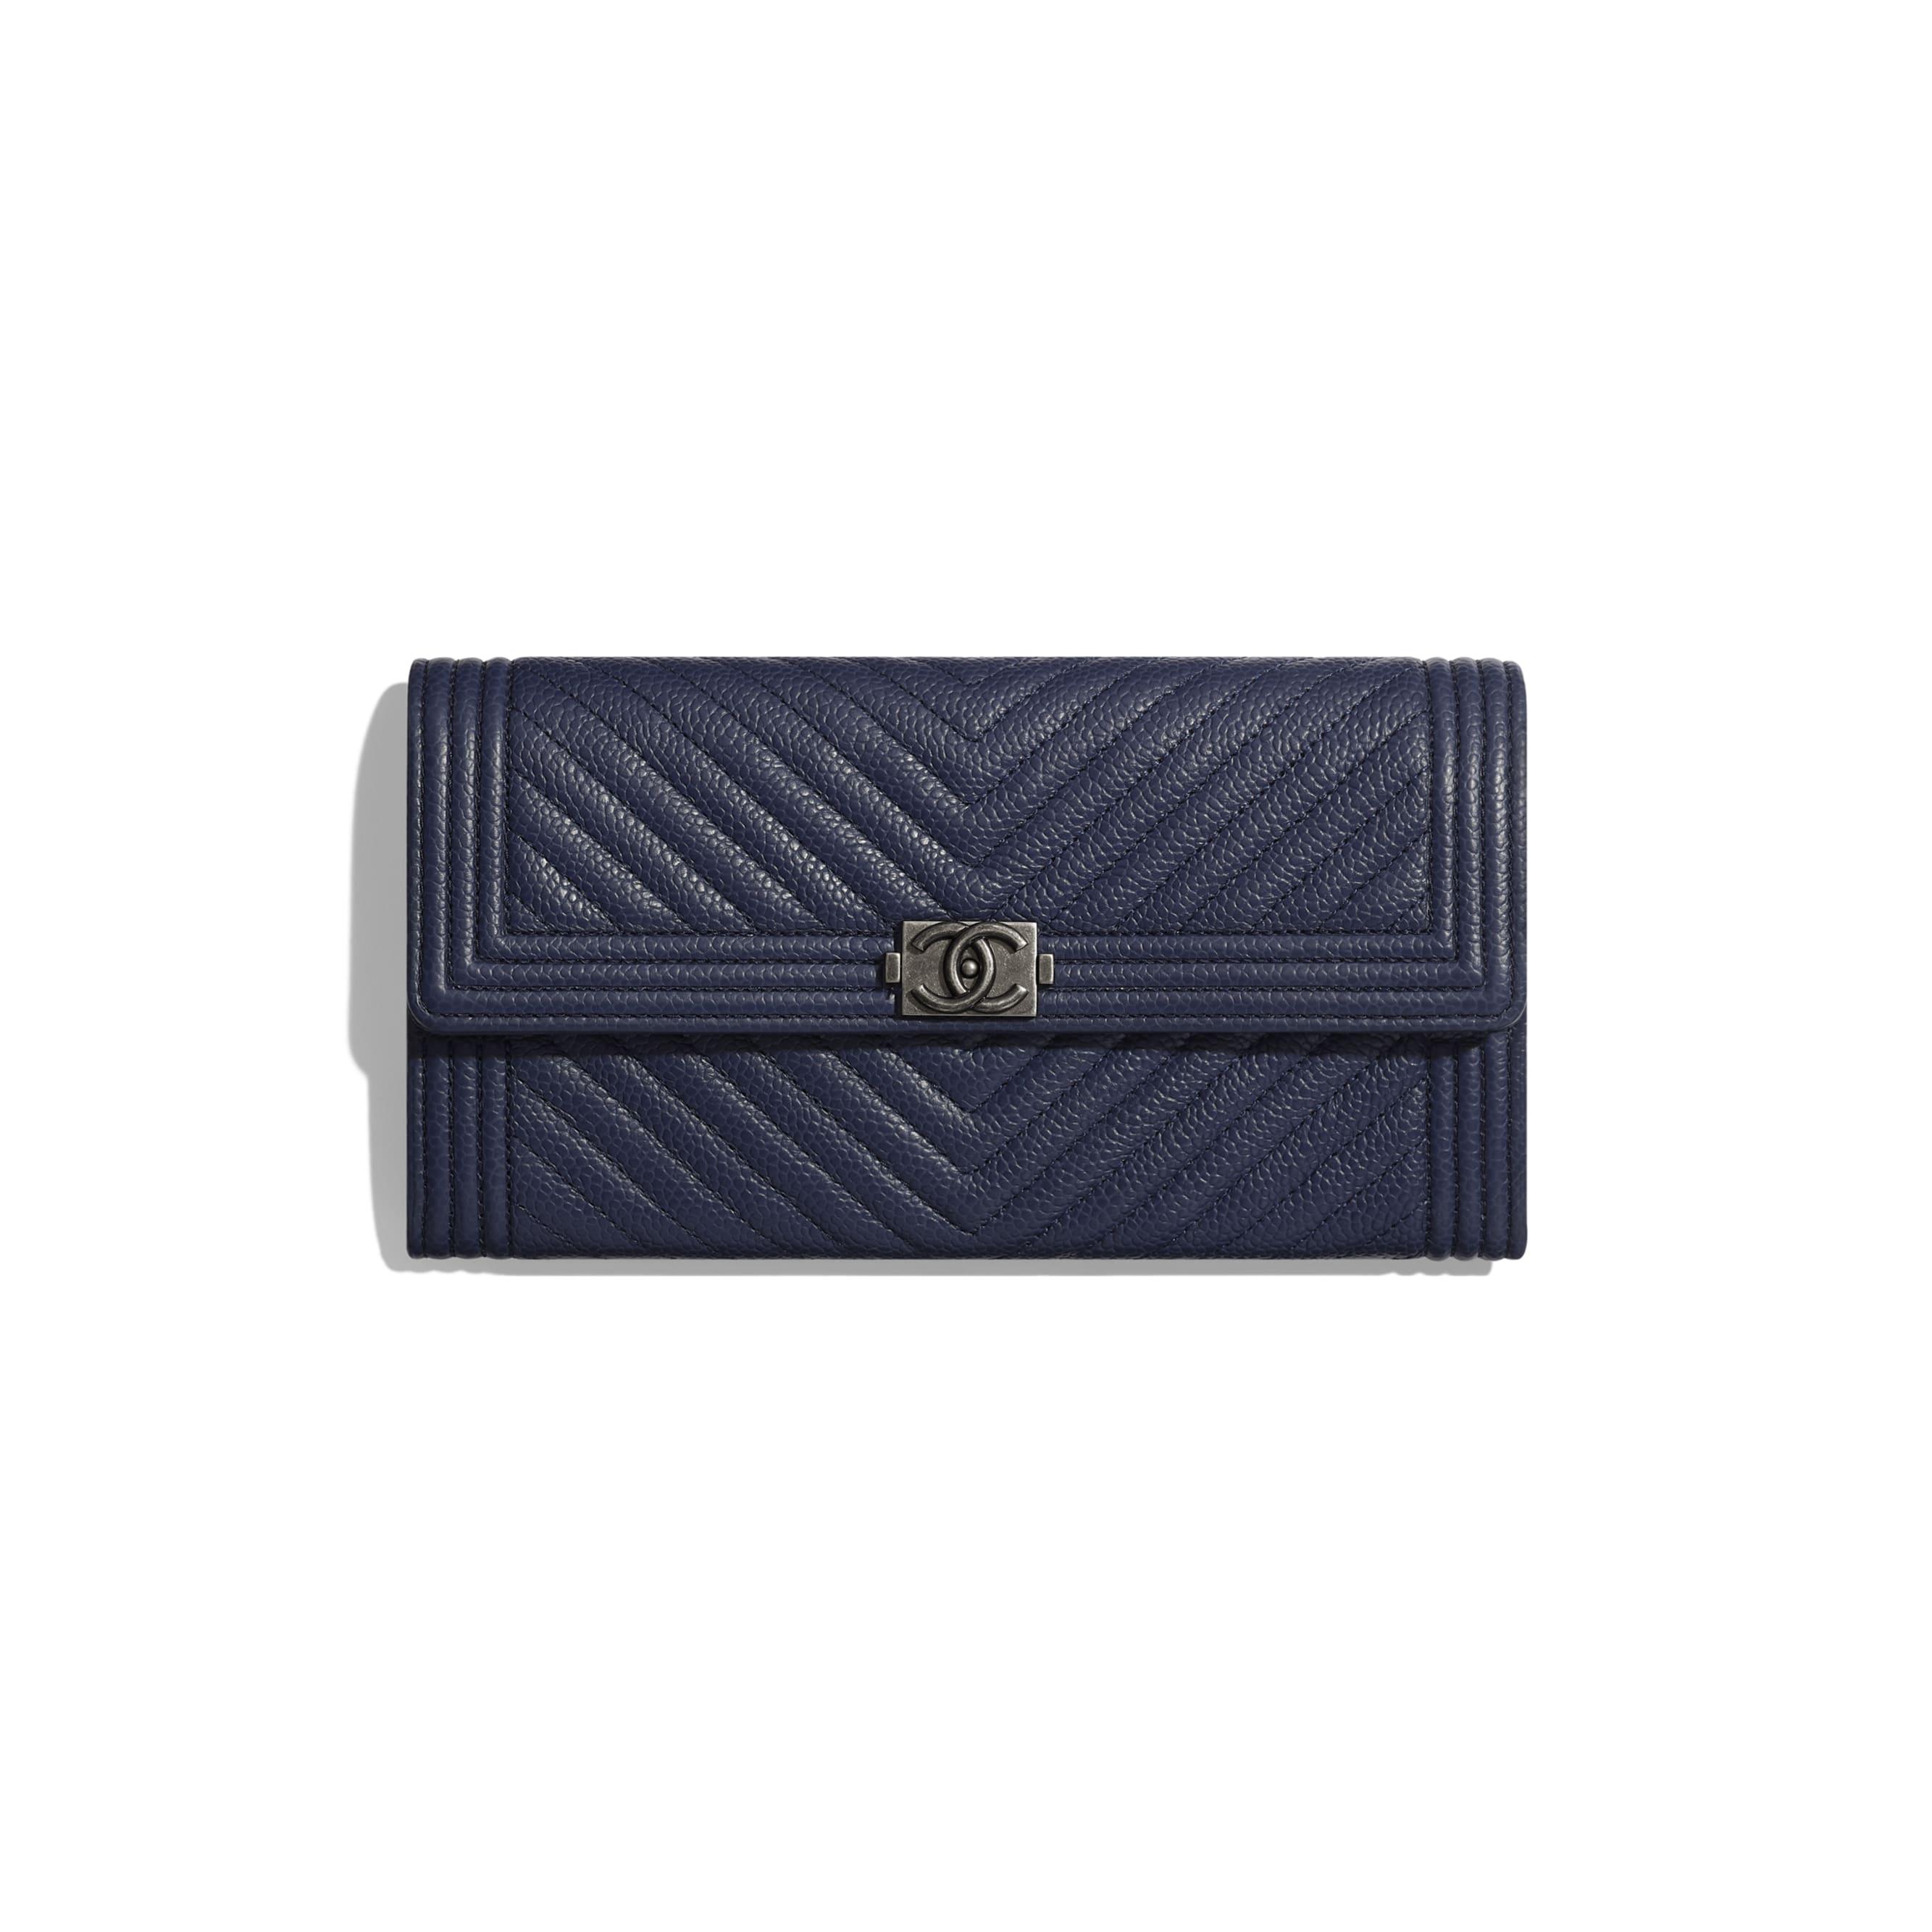 BOY CHANEL Long Flap Wallet - Navy Blue - Grained Calfskin & Ruthenium-Finish Metal - Default view - see standard sized version